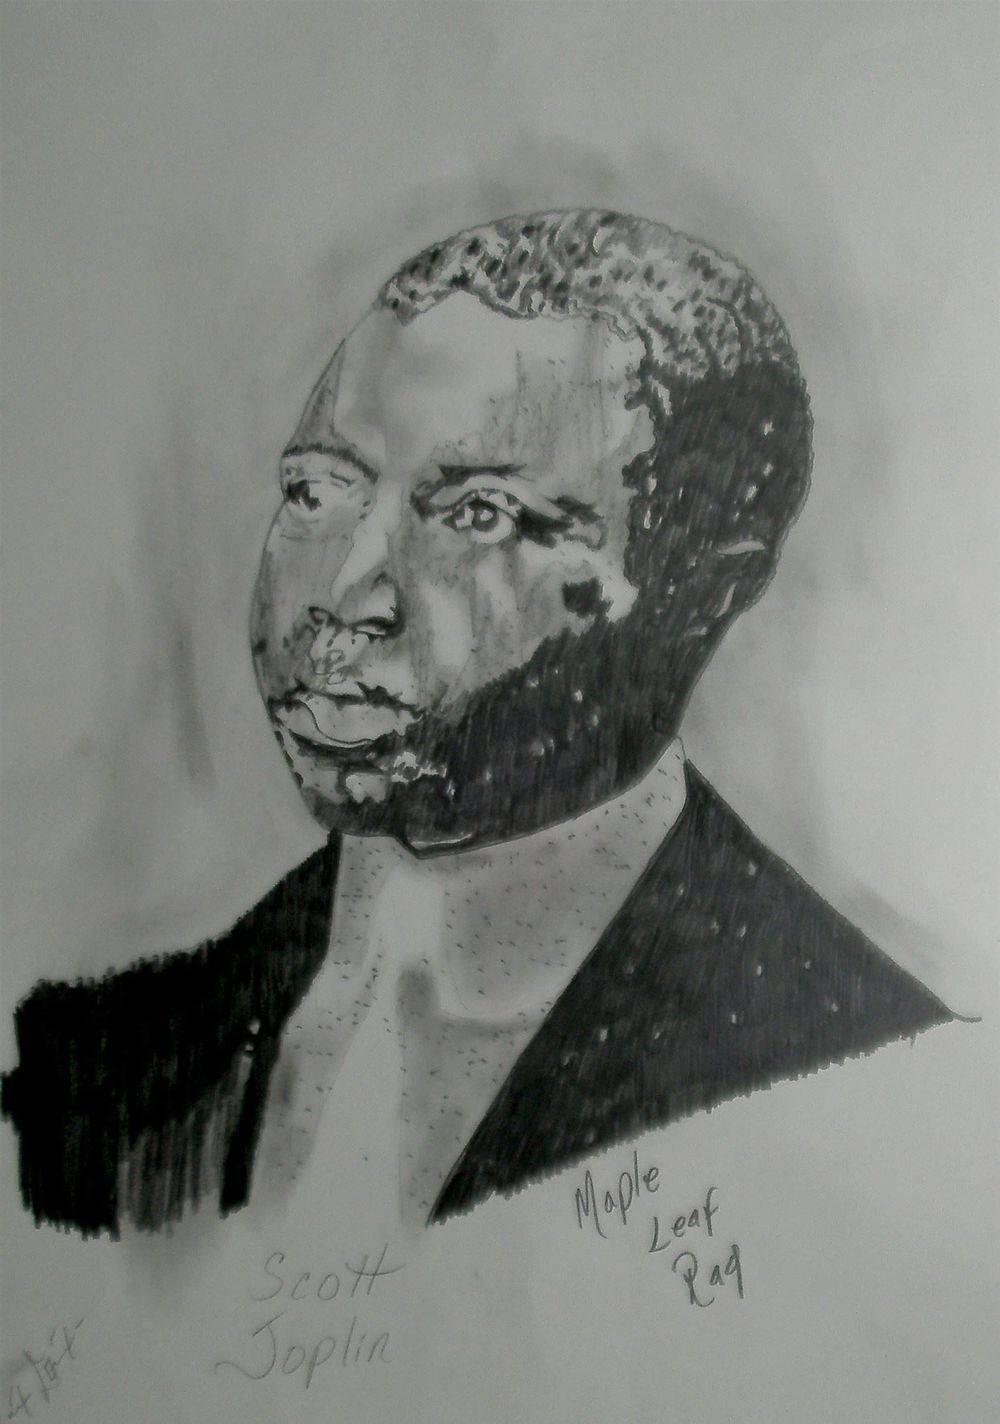 Scott Joplin : Jazz